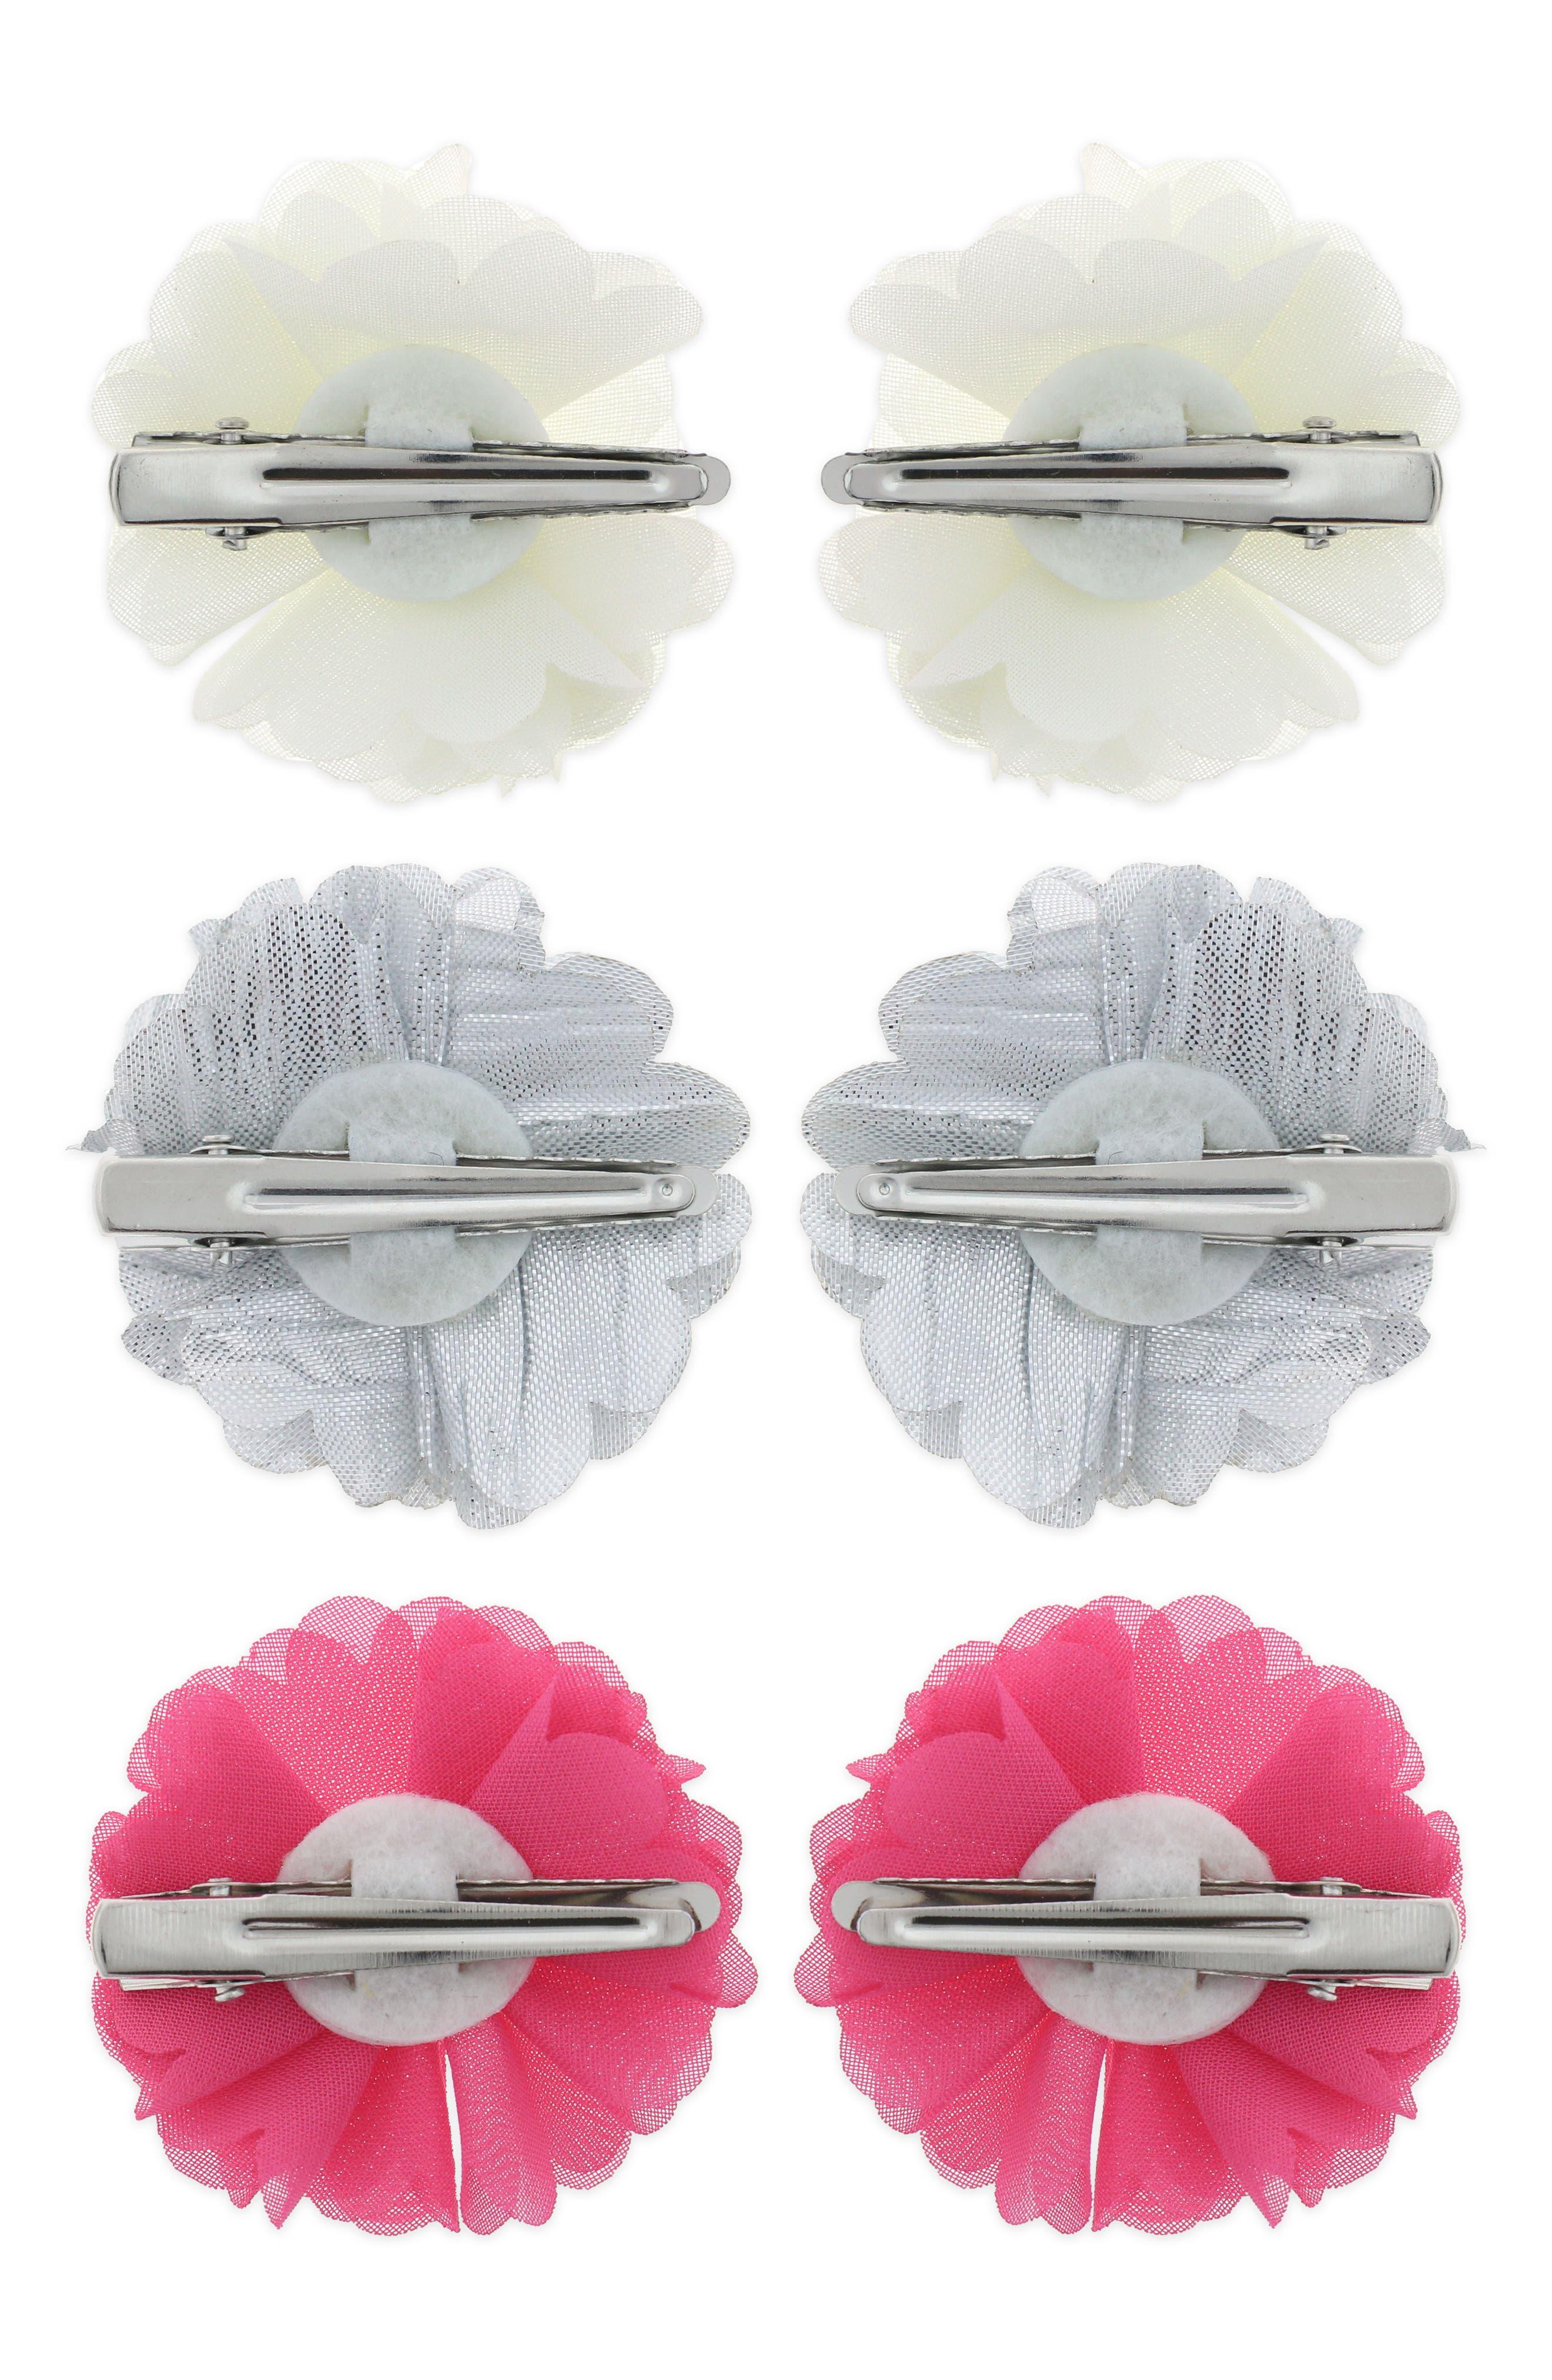 6-Piece Hair Clip Set,                             Alternate thumbnail 2, color,                             FUCHSIA